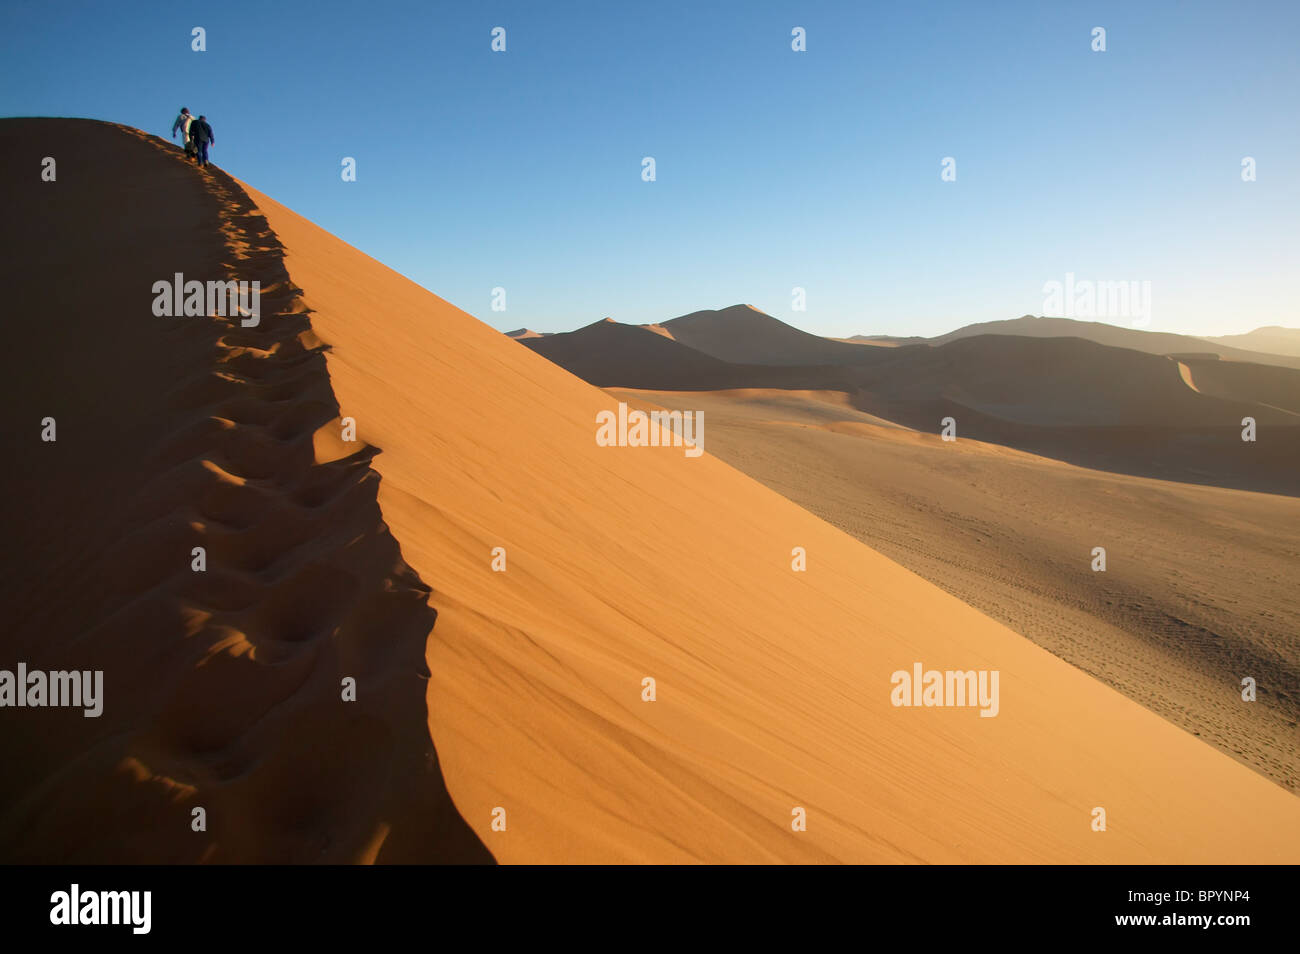 Travelers hike a dune ridge, Namibia - Stock Image